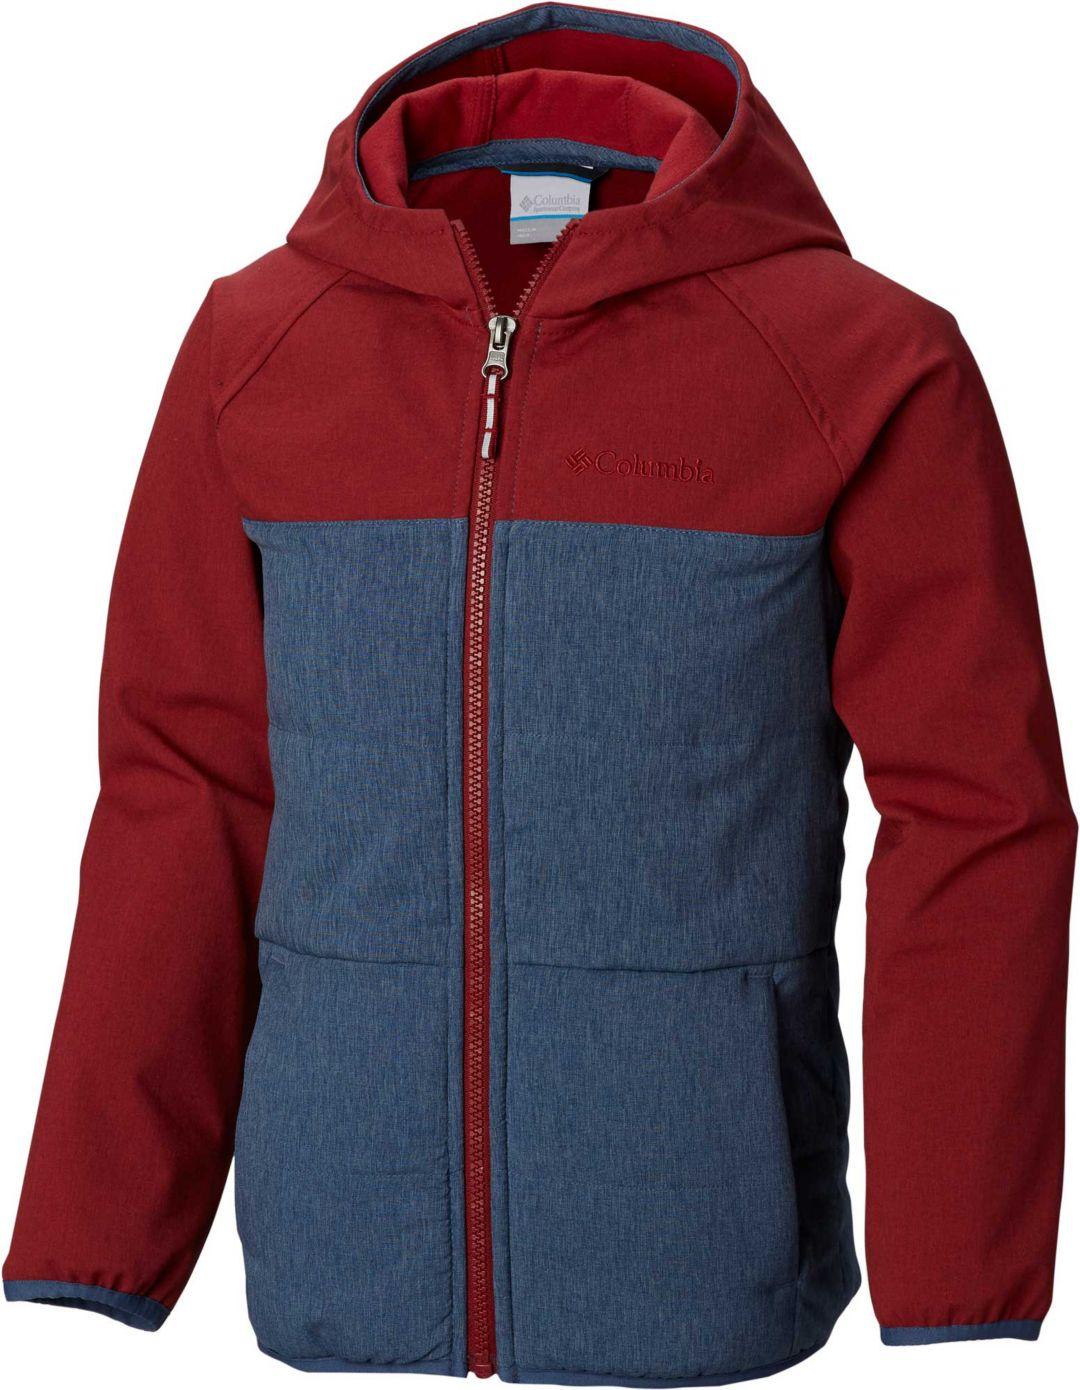 daecf682 Columbia Boys' Take A Hike Soft Shell Jacket | DICK'S Sporting Goods